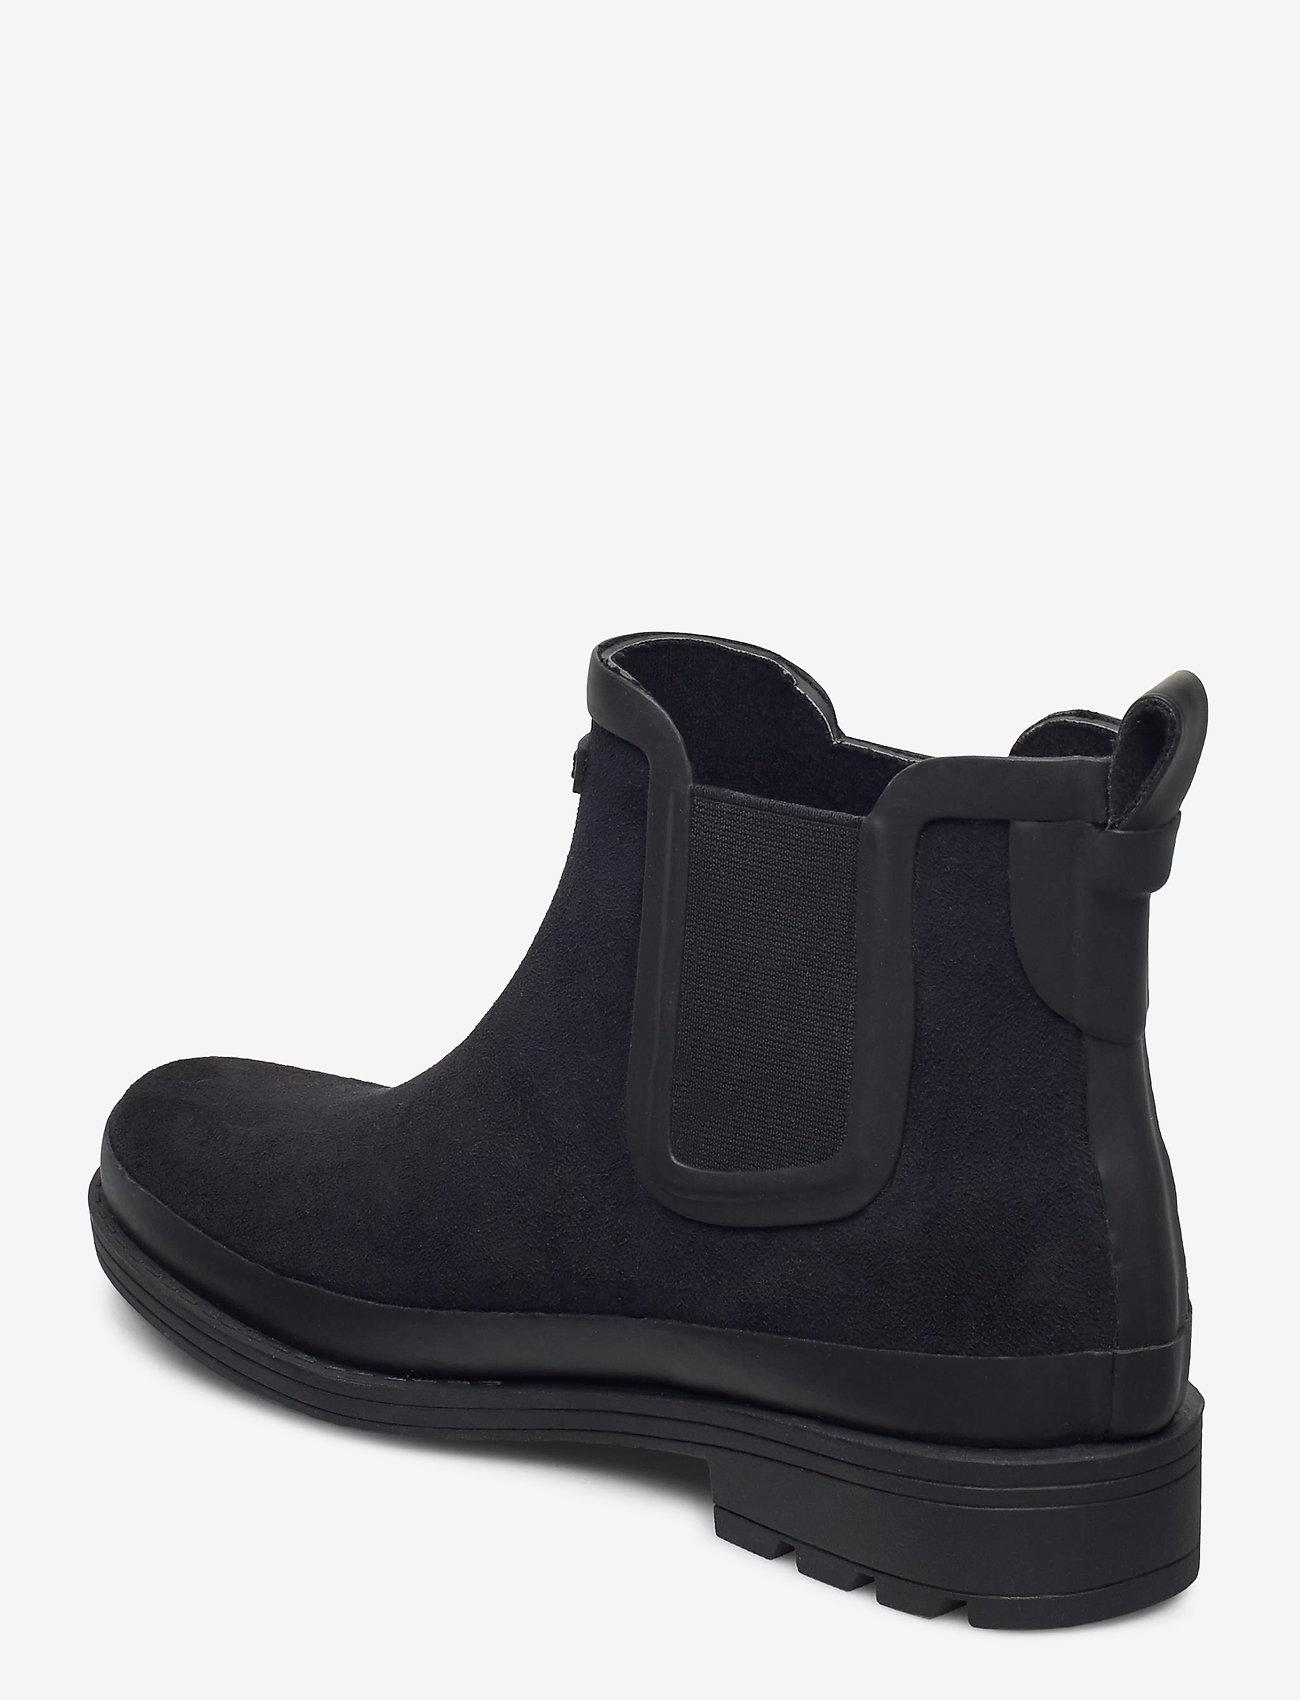 Ai Textile Boot W Noir (Noir) (70 €) - Aigle BTXDD